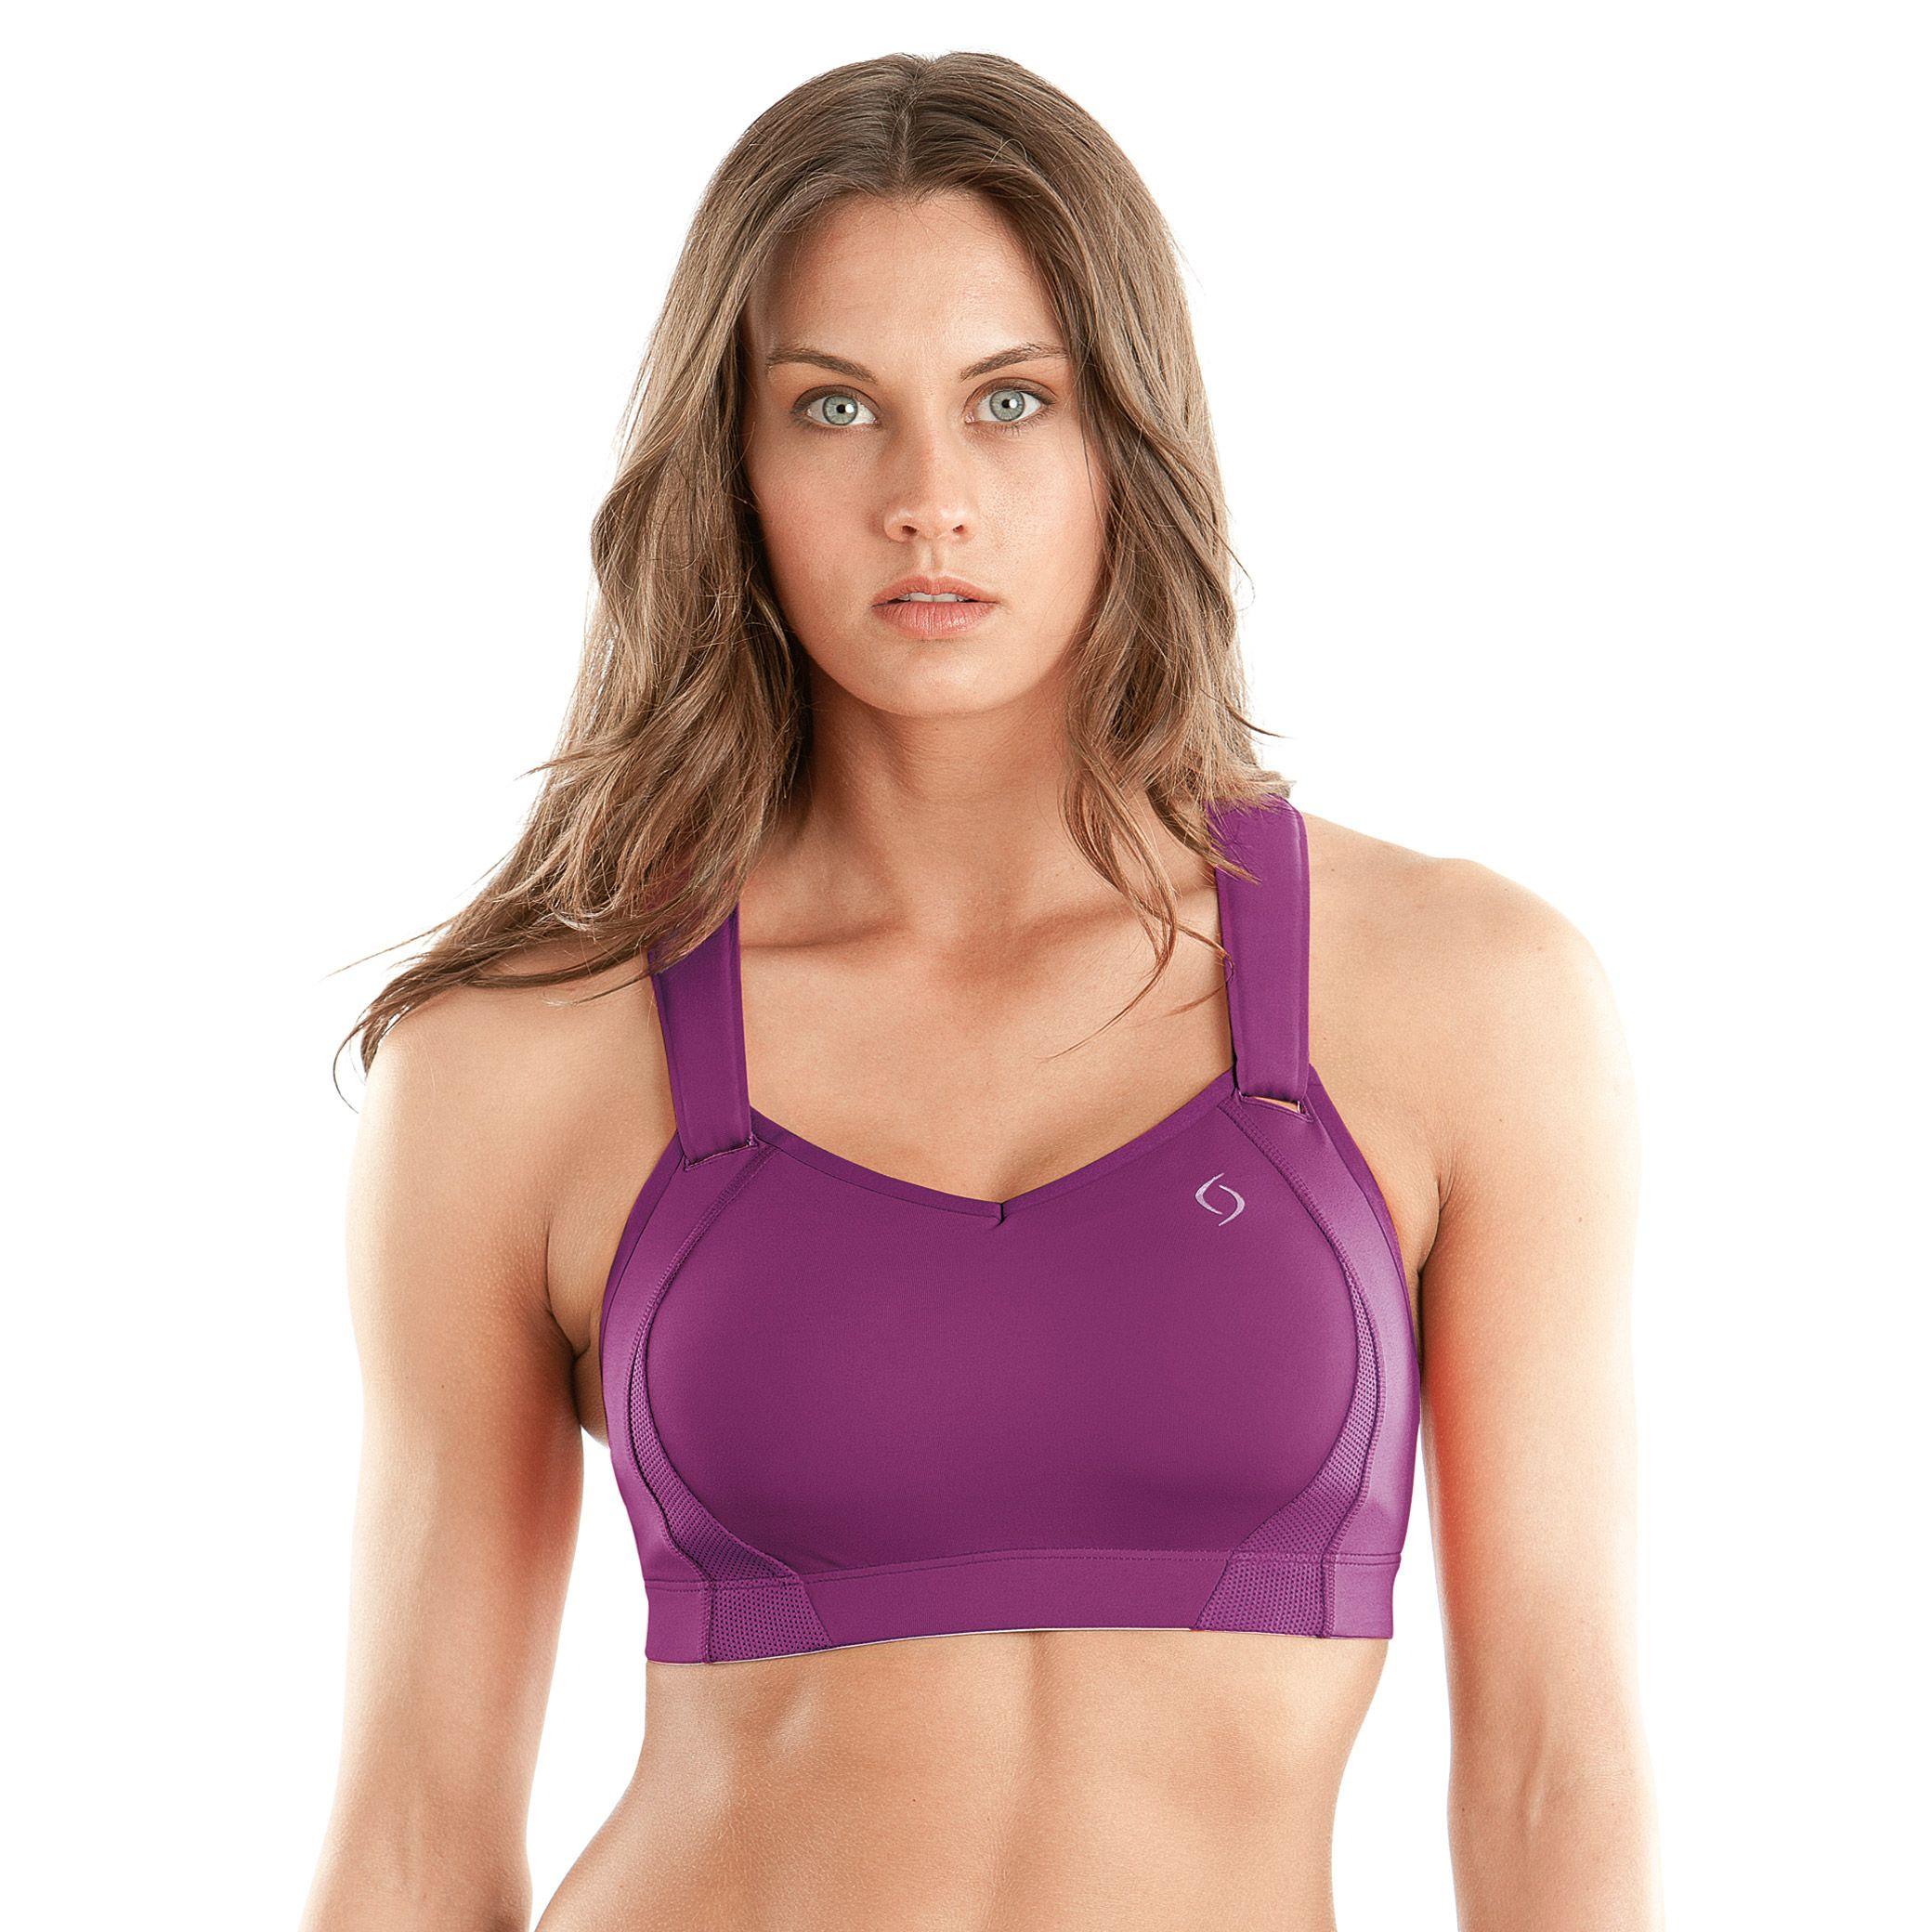 71fc33007e5ef Juno sports bra | Moving Comfort | Fashion | Best sports bras ...